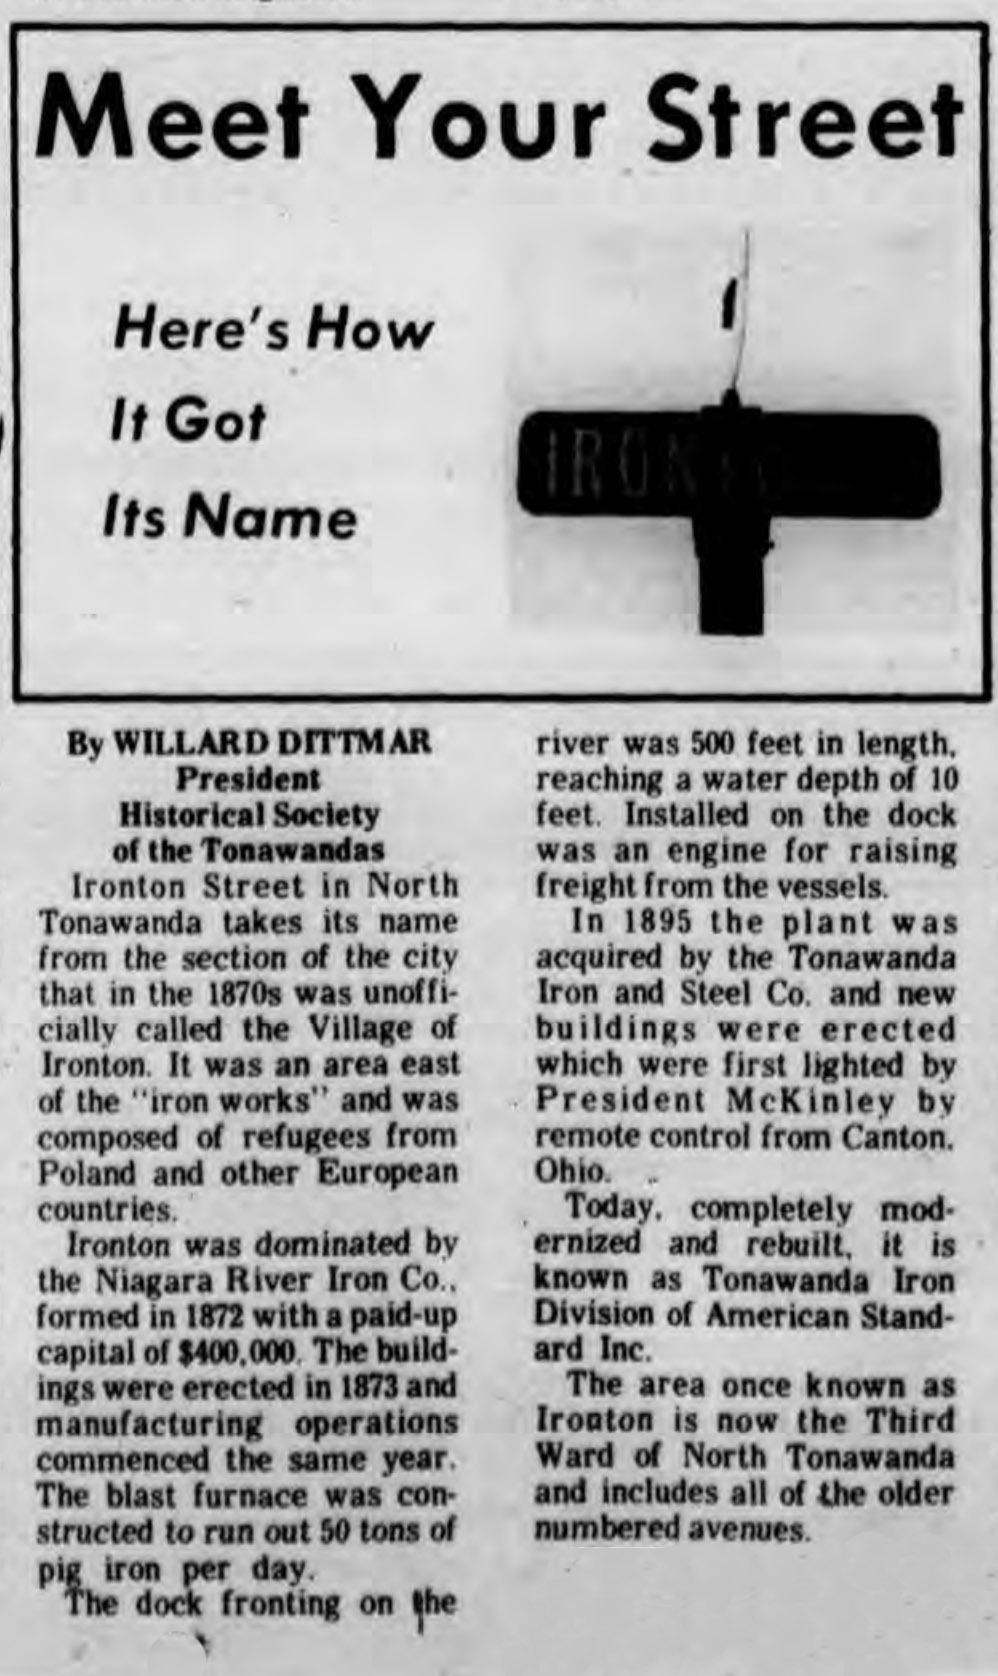 Meet Your Street - Ironton (Tonawanada News, 1970-02-14).jpg